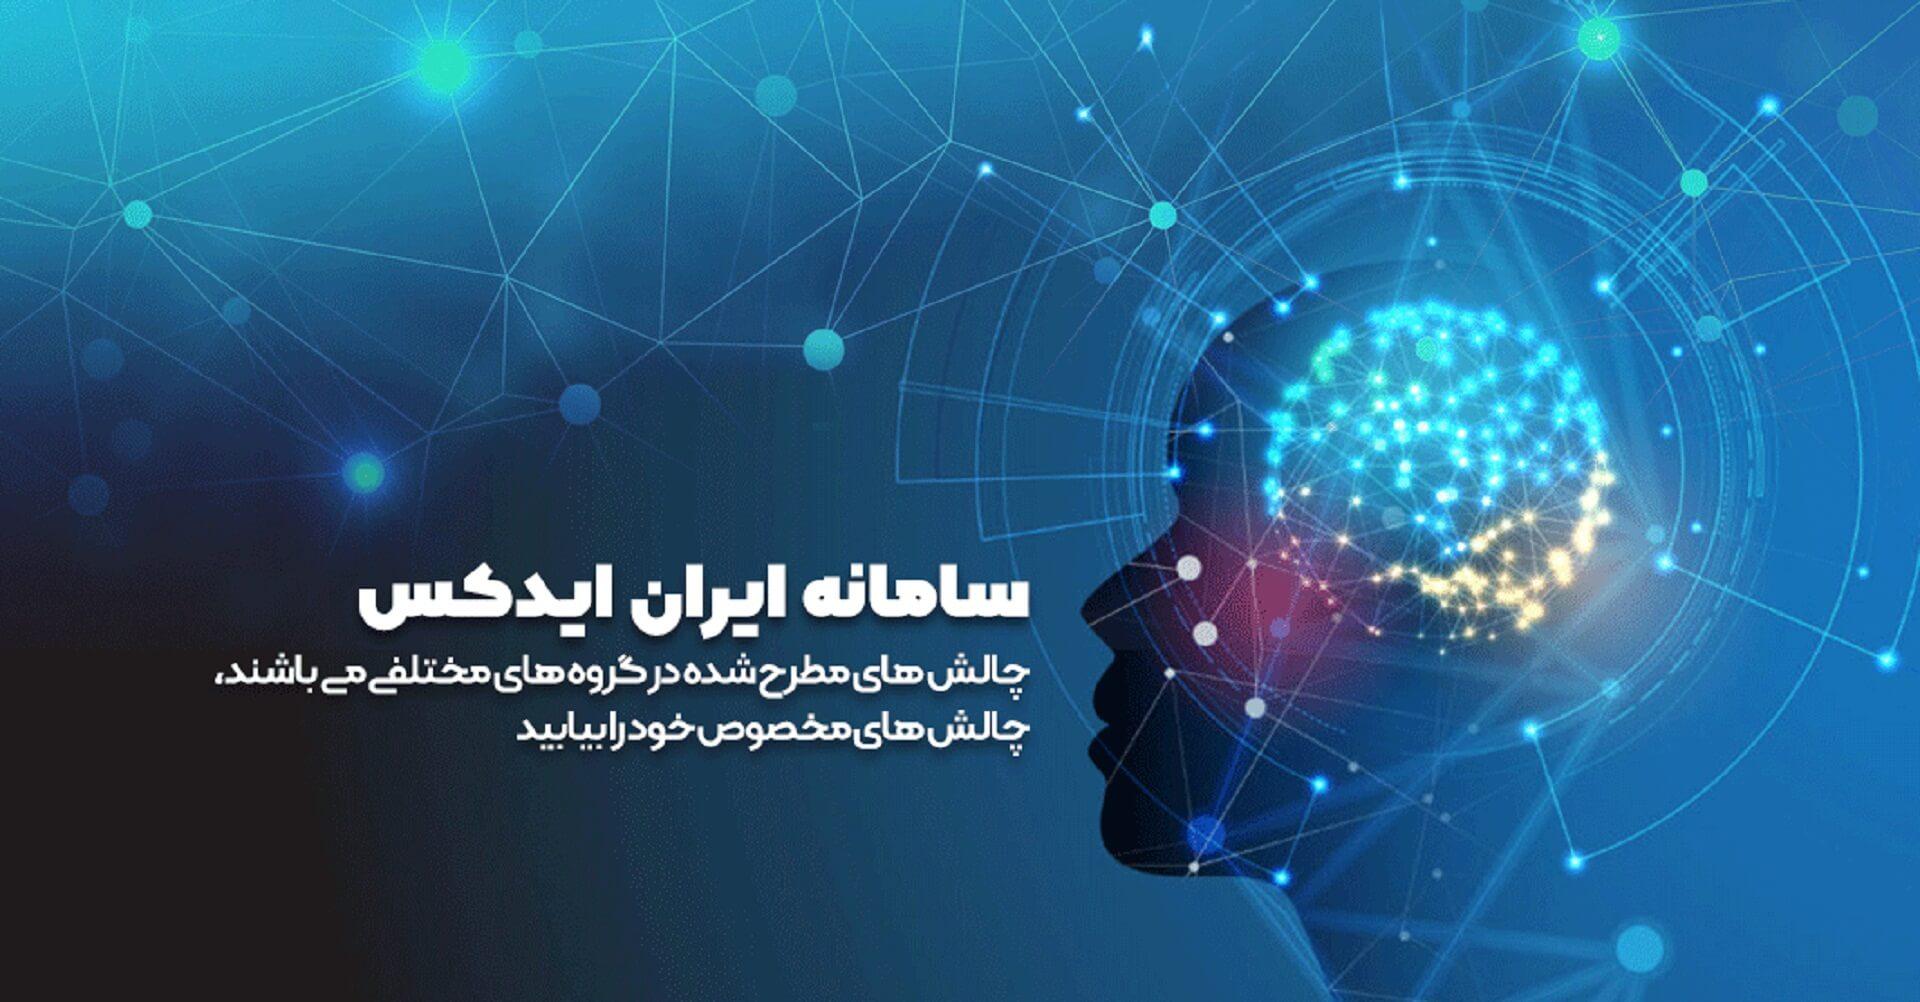 سامانه ایران ایدکس